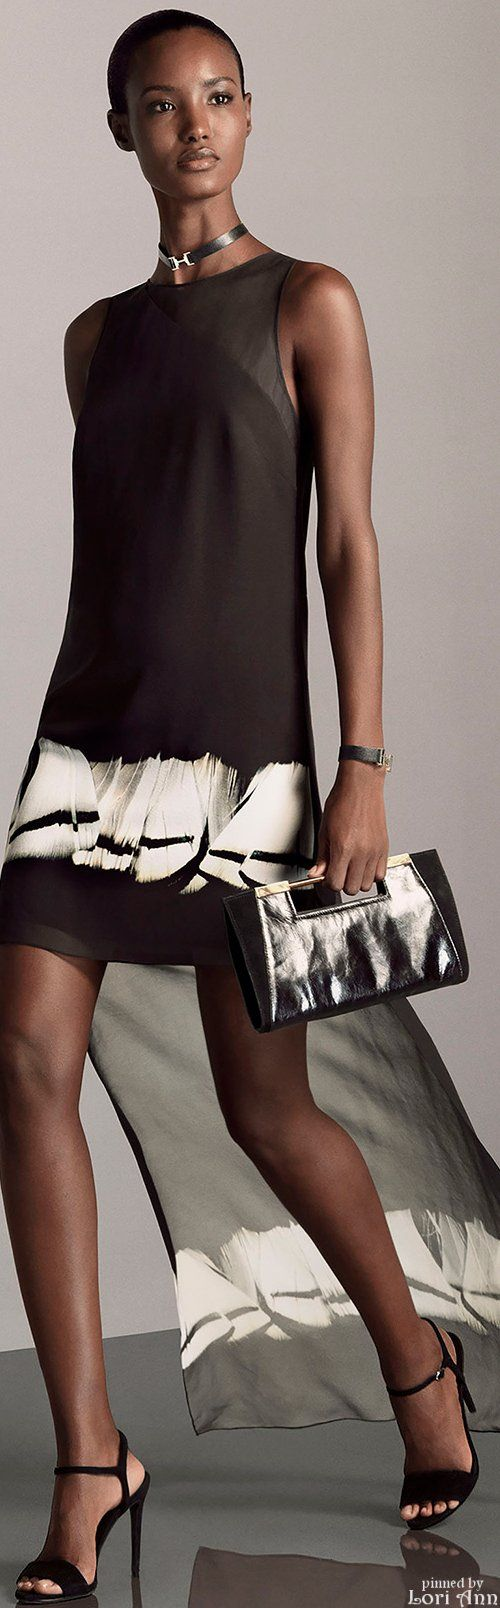 Short dark women dress. Cocktail clothing, purse.